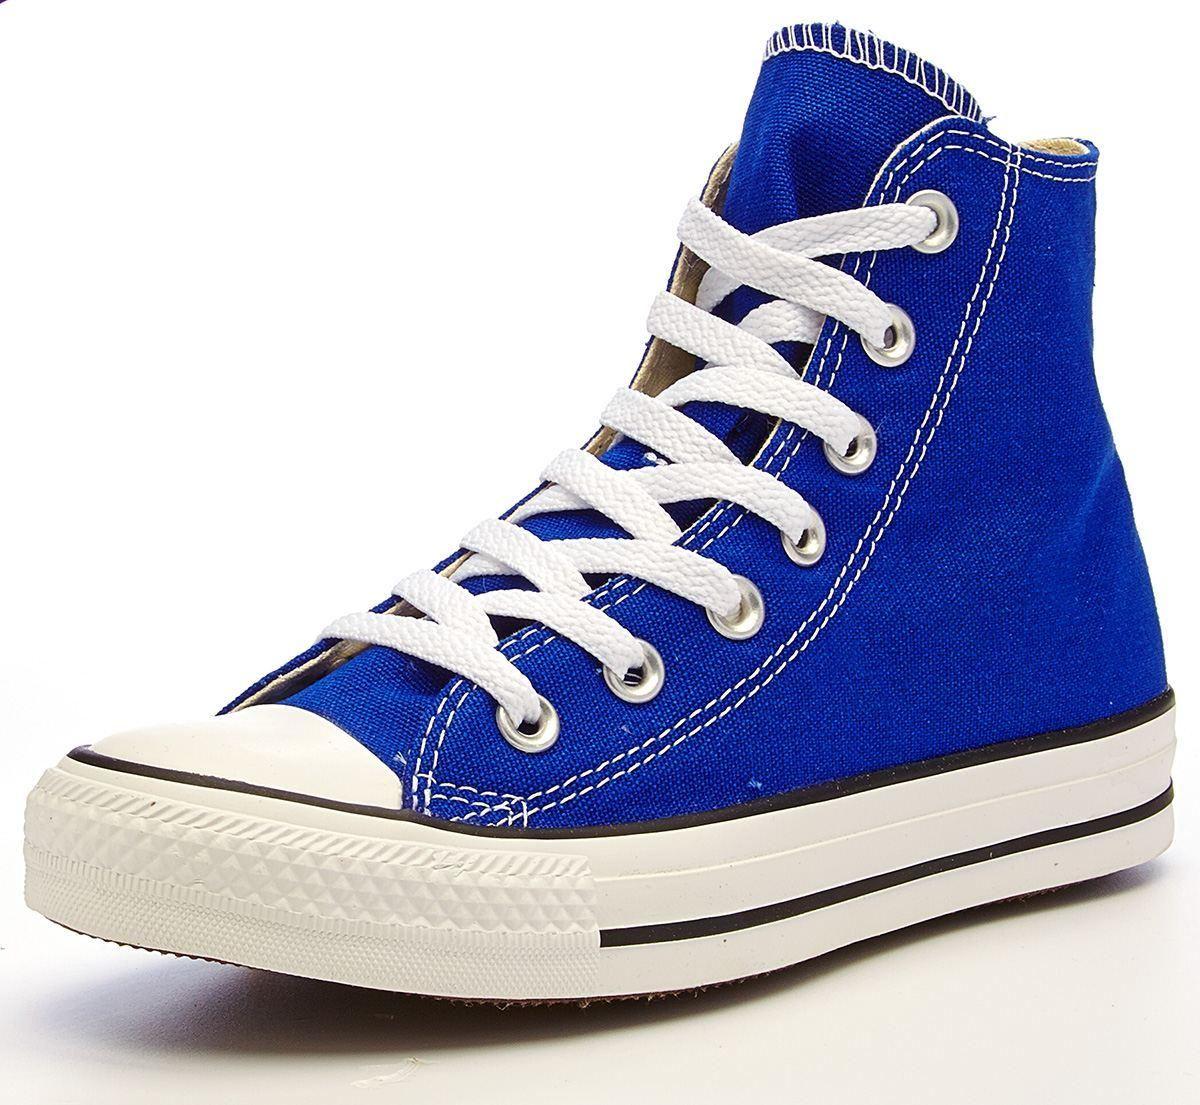 2all star converse blu elettrico